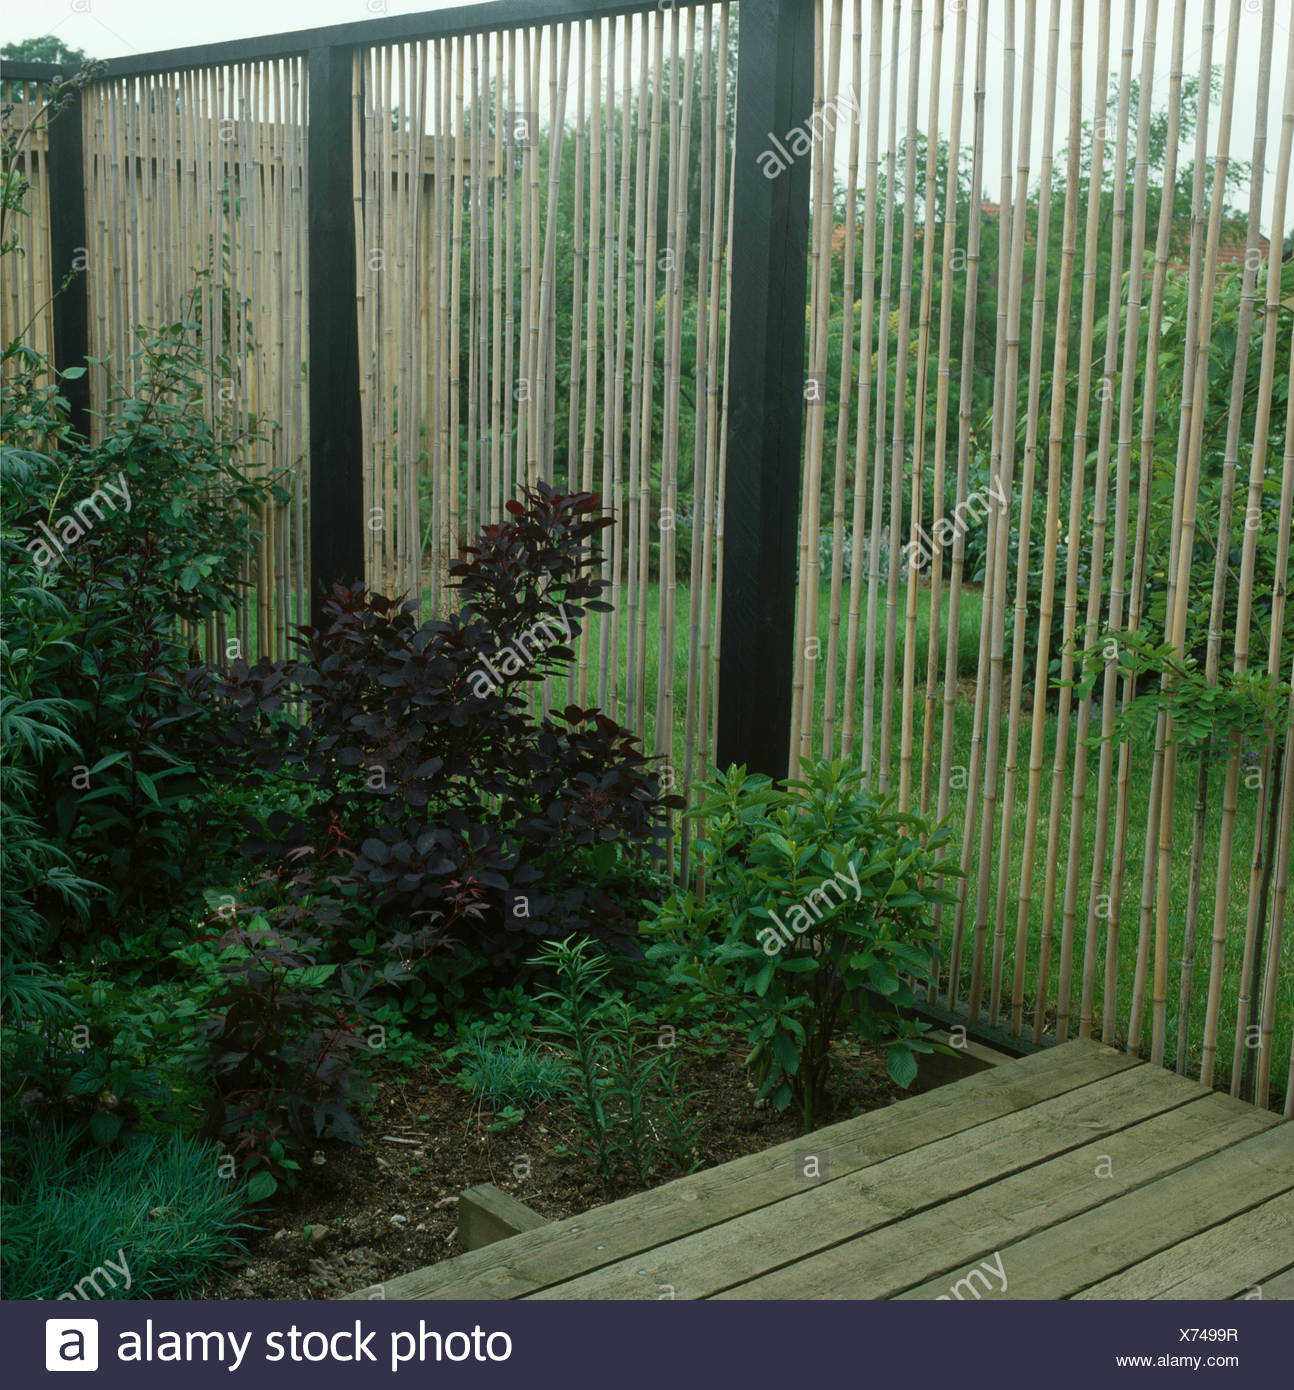 Bamboo Fence Beside Shrubs In Garden Border Stock Photo Alamy